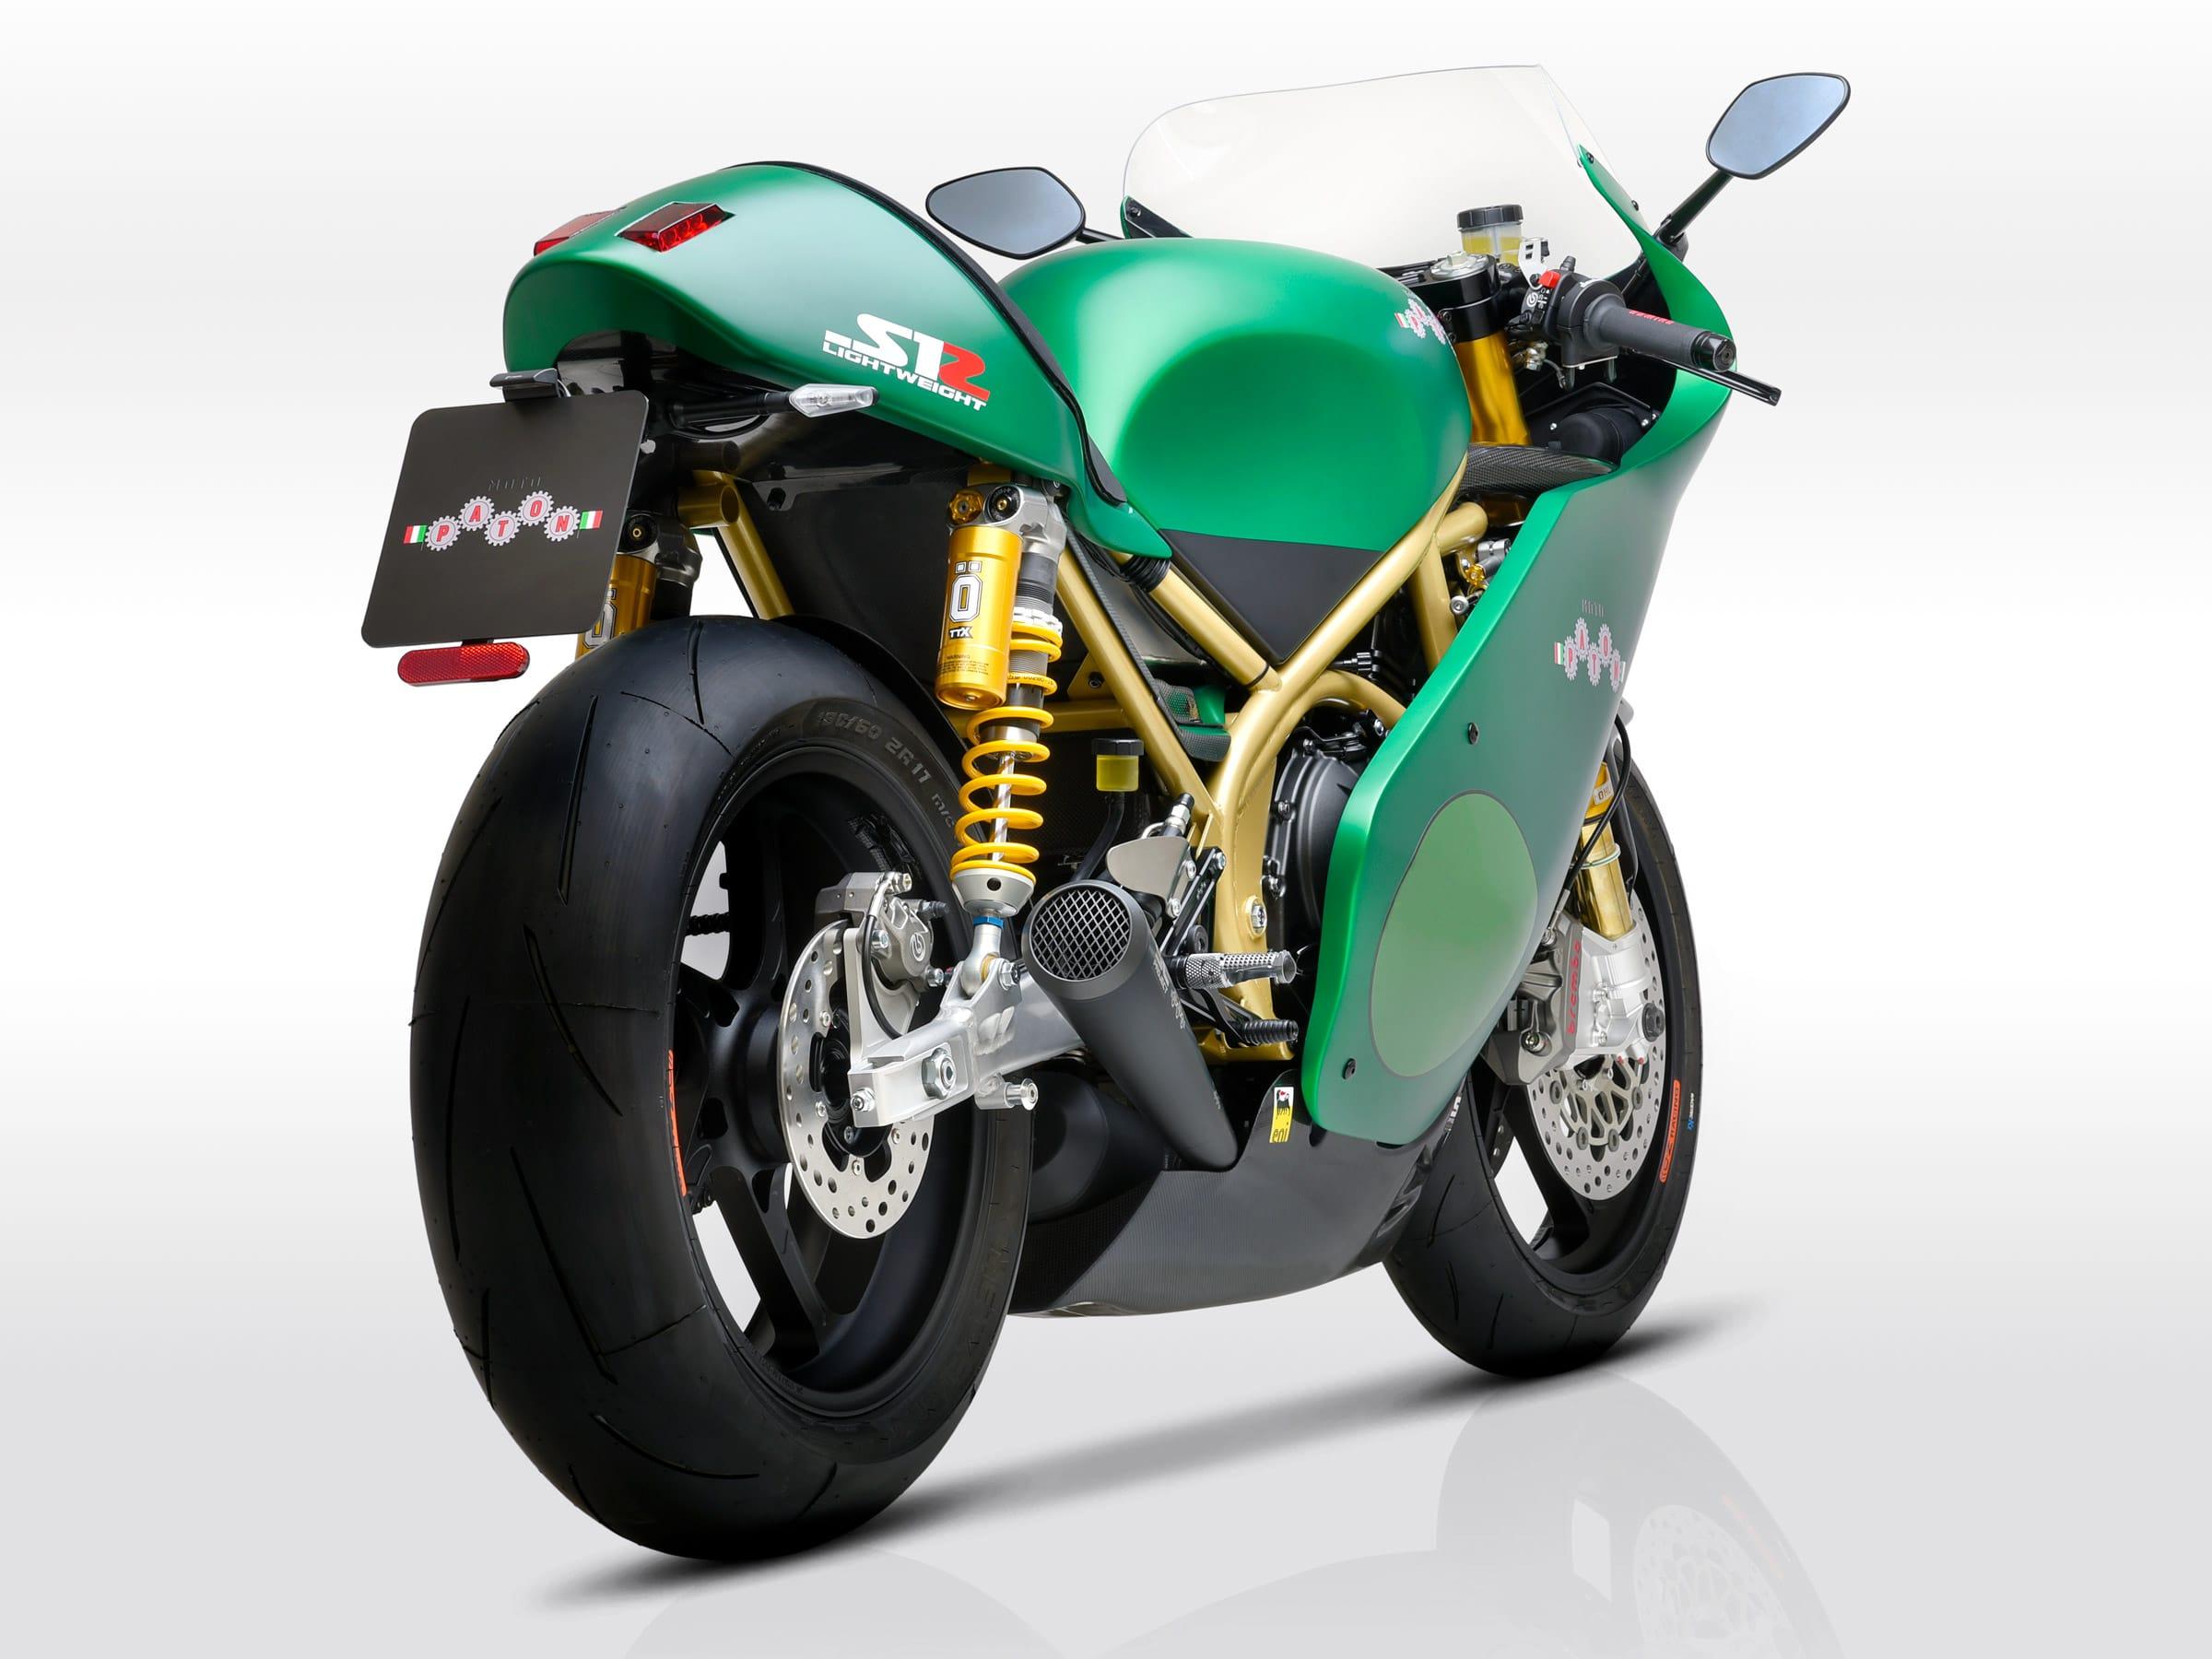 Paton_S1R-Lightweight_Stradale-Omologata_Posteriore-DX-min